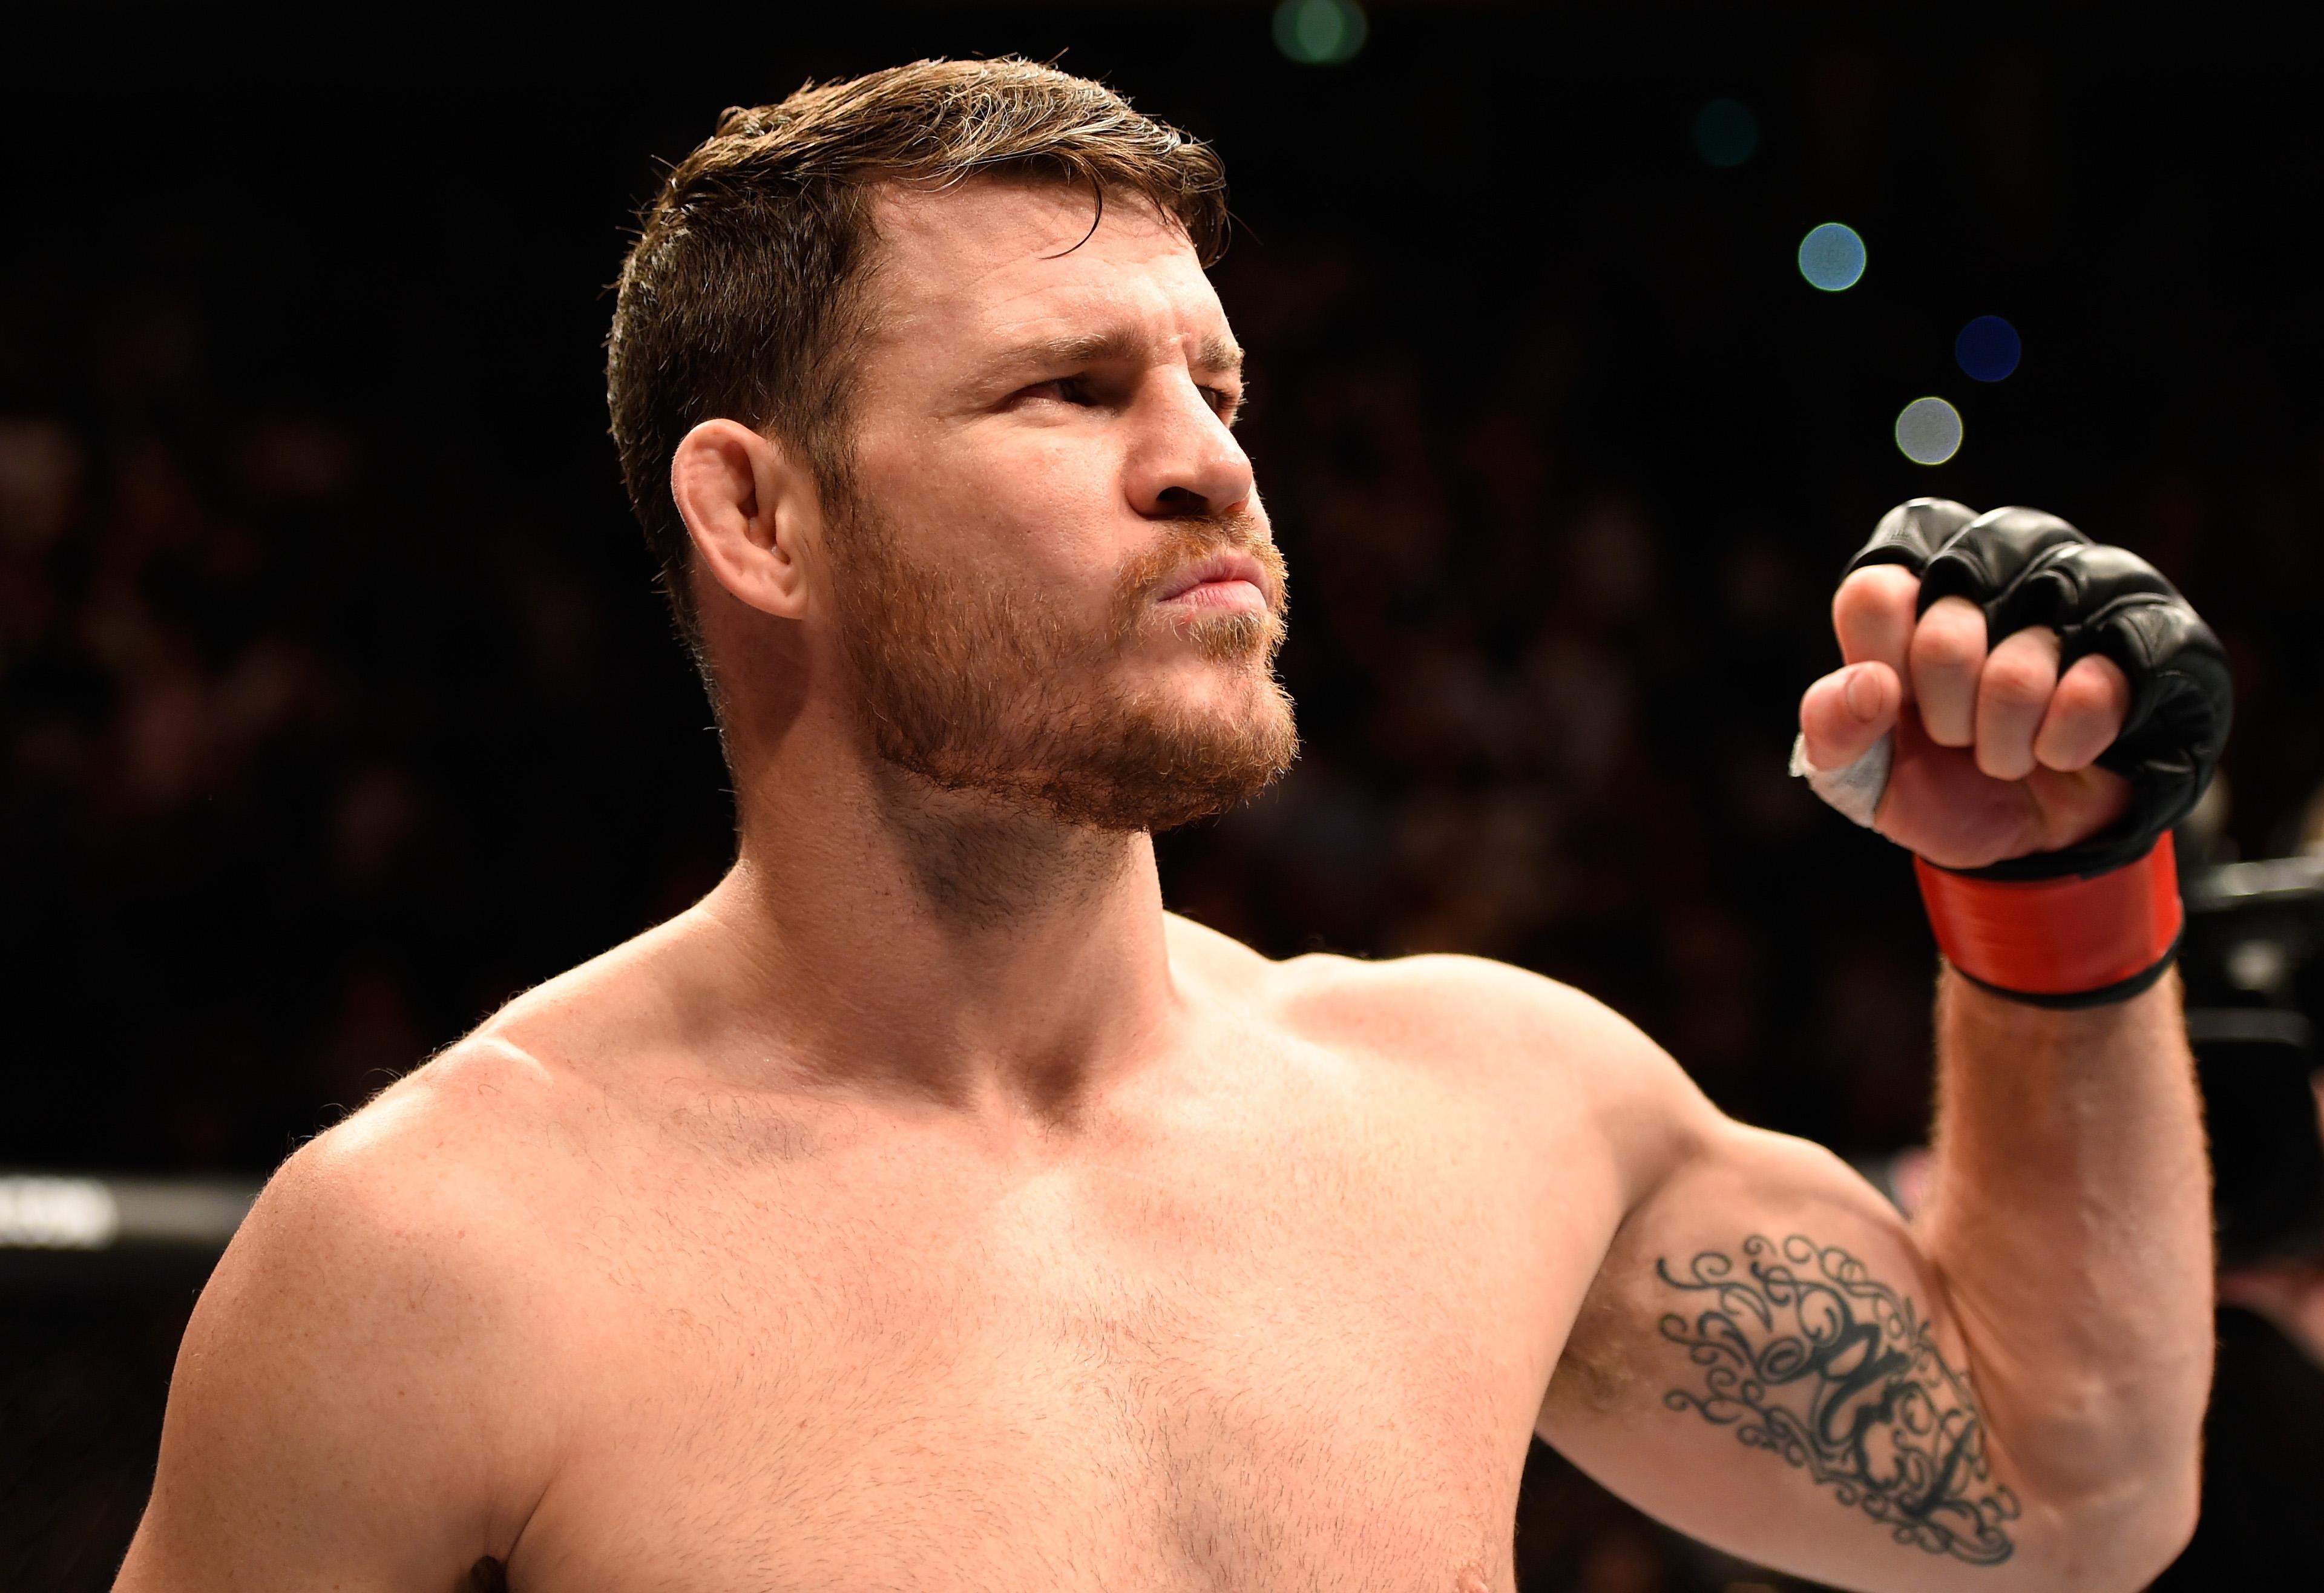 British MMA legend Michael Bisping inspired Kevin Fryer